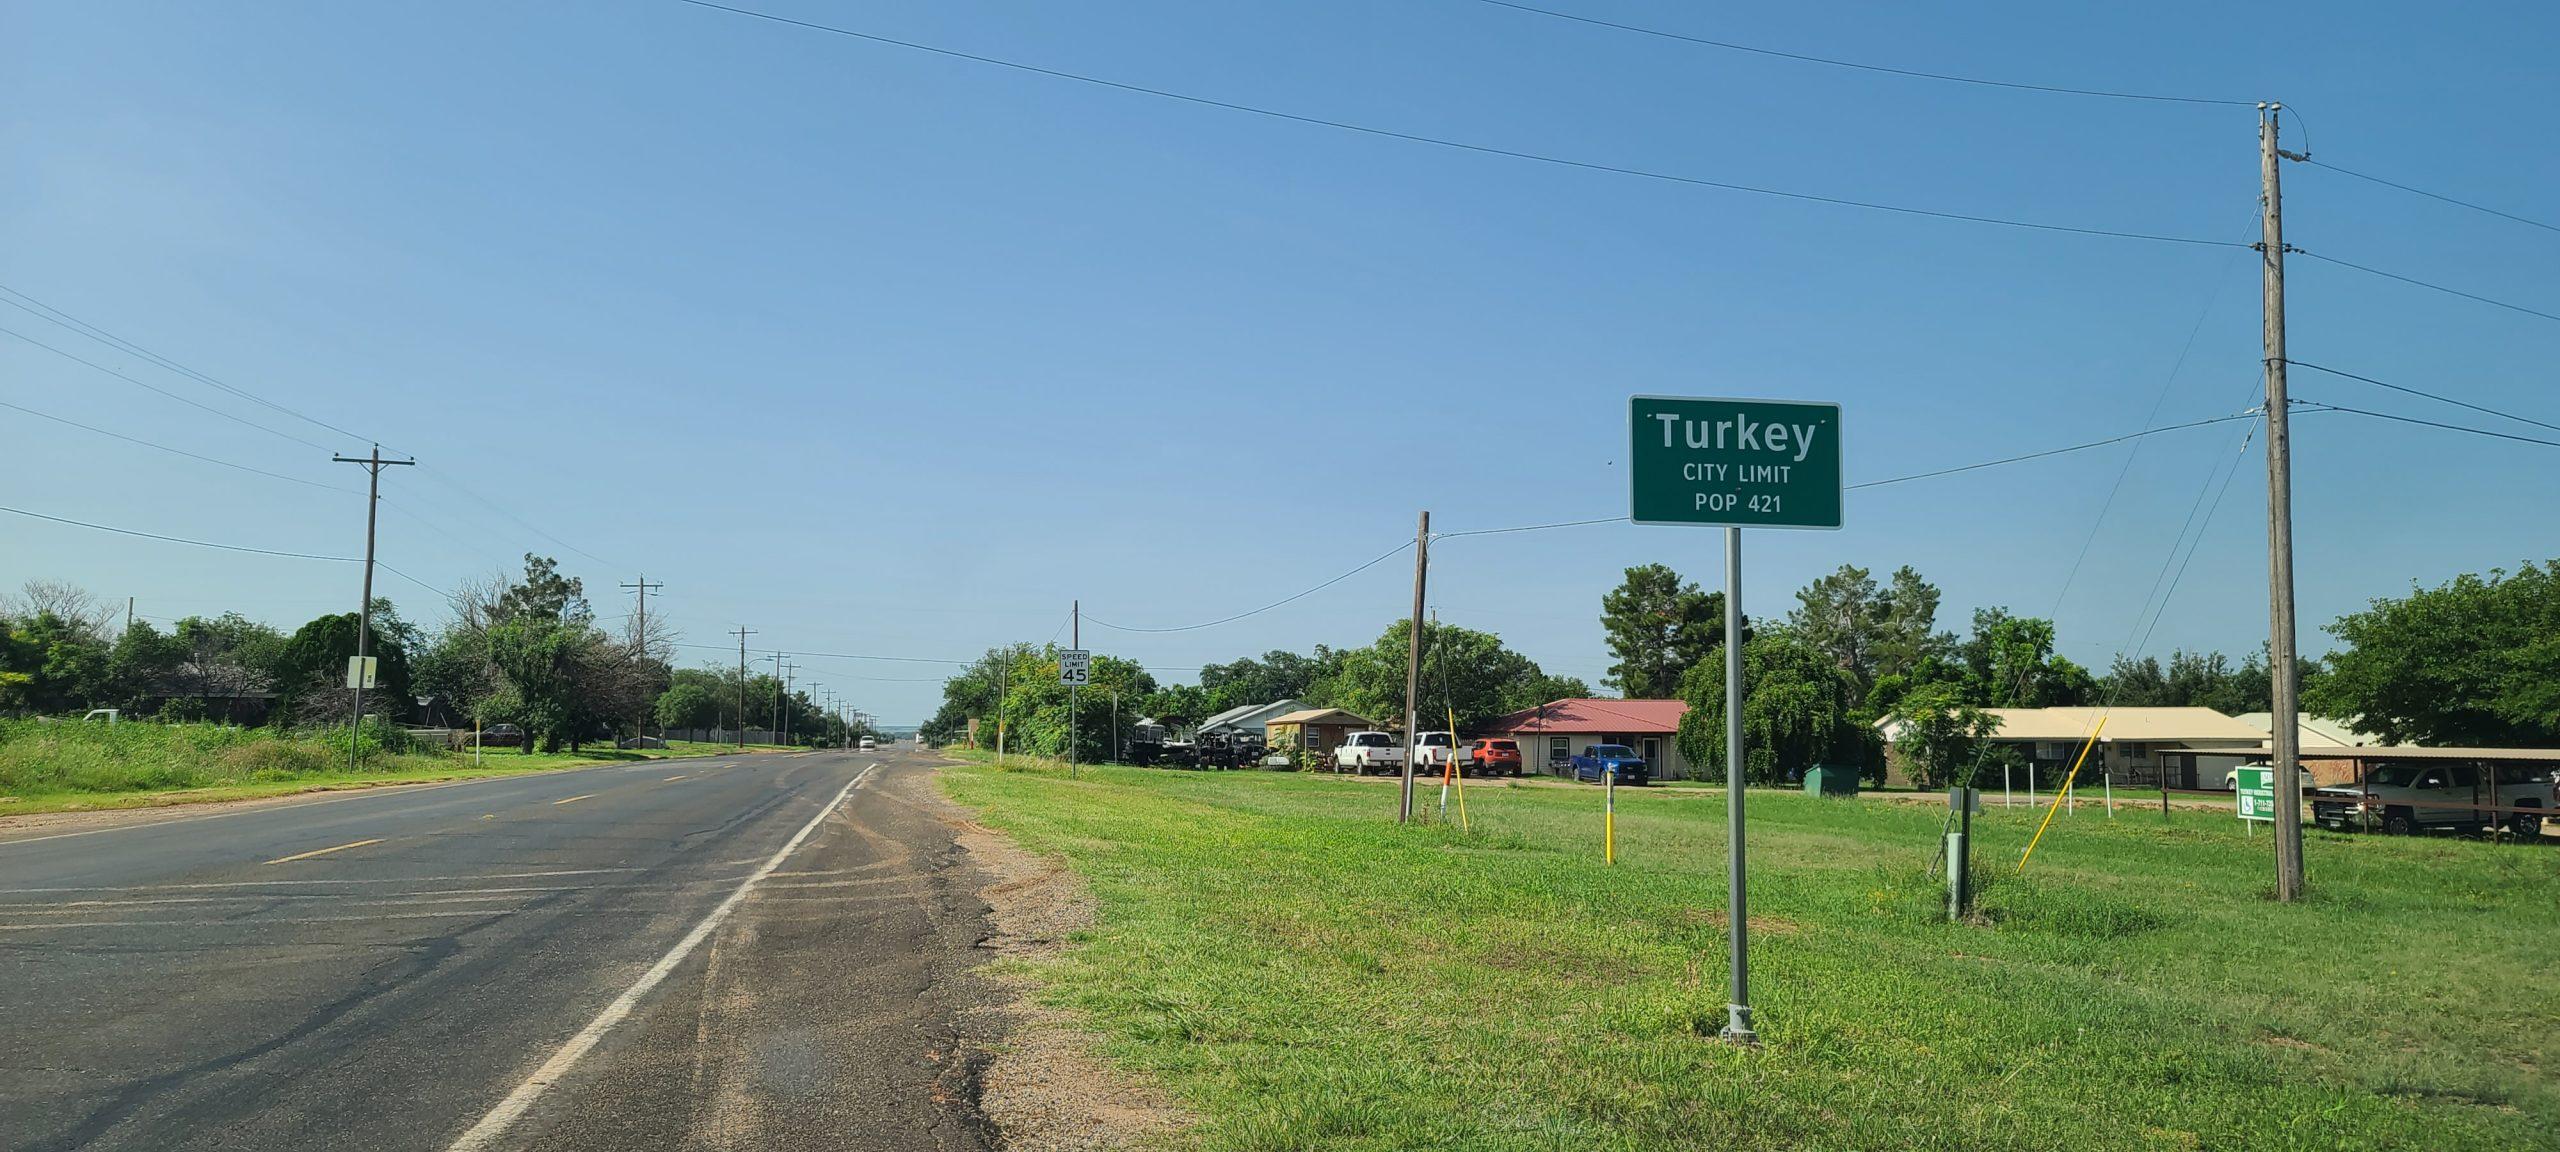 Turkey, Texas Population Sign